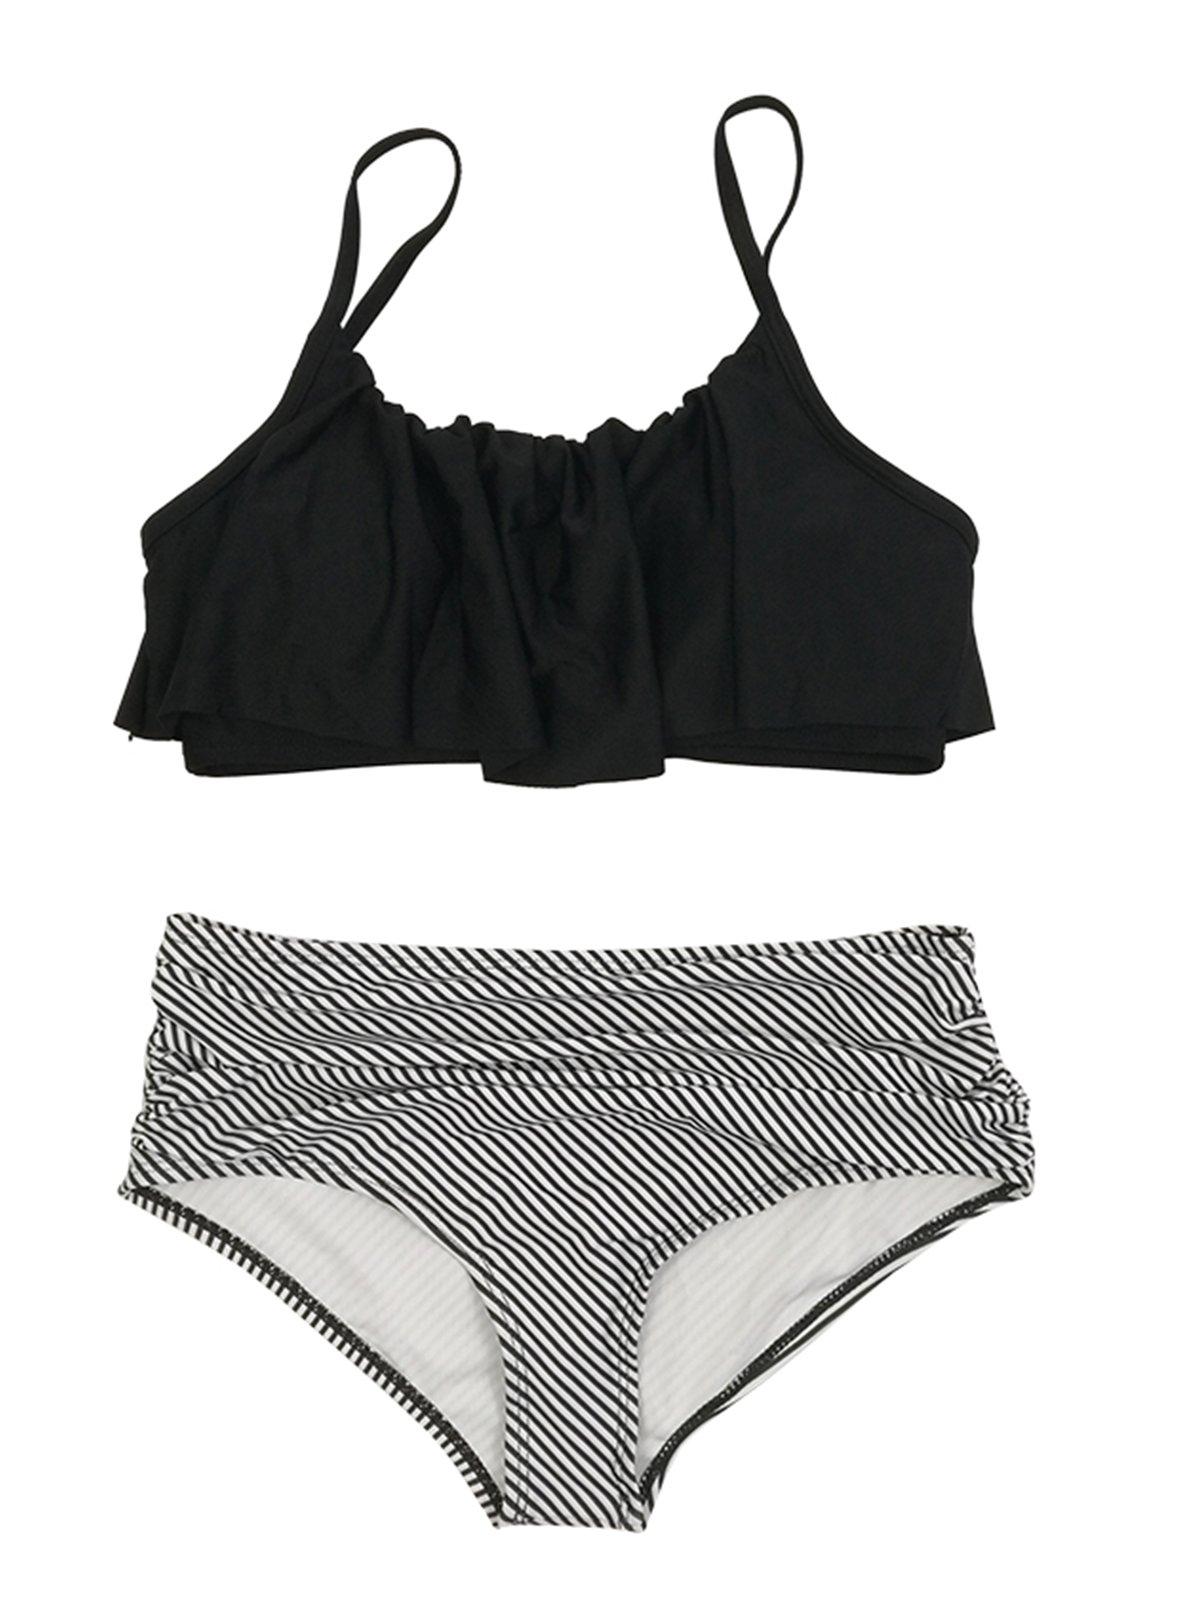 8eaf36560ad23 Get Quotations · Zando Women High Waist Tummy Control Bikini Swimsuit  Vintage Ruffled Flounce Two Piece Bikini Set Bathing